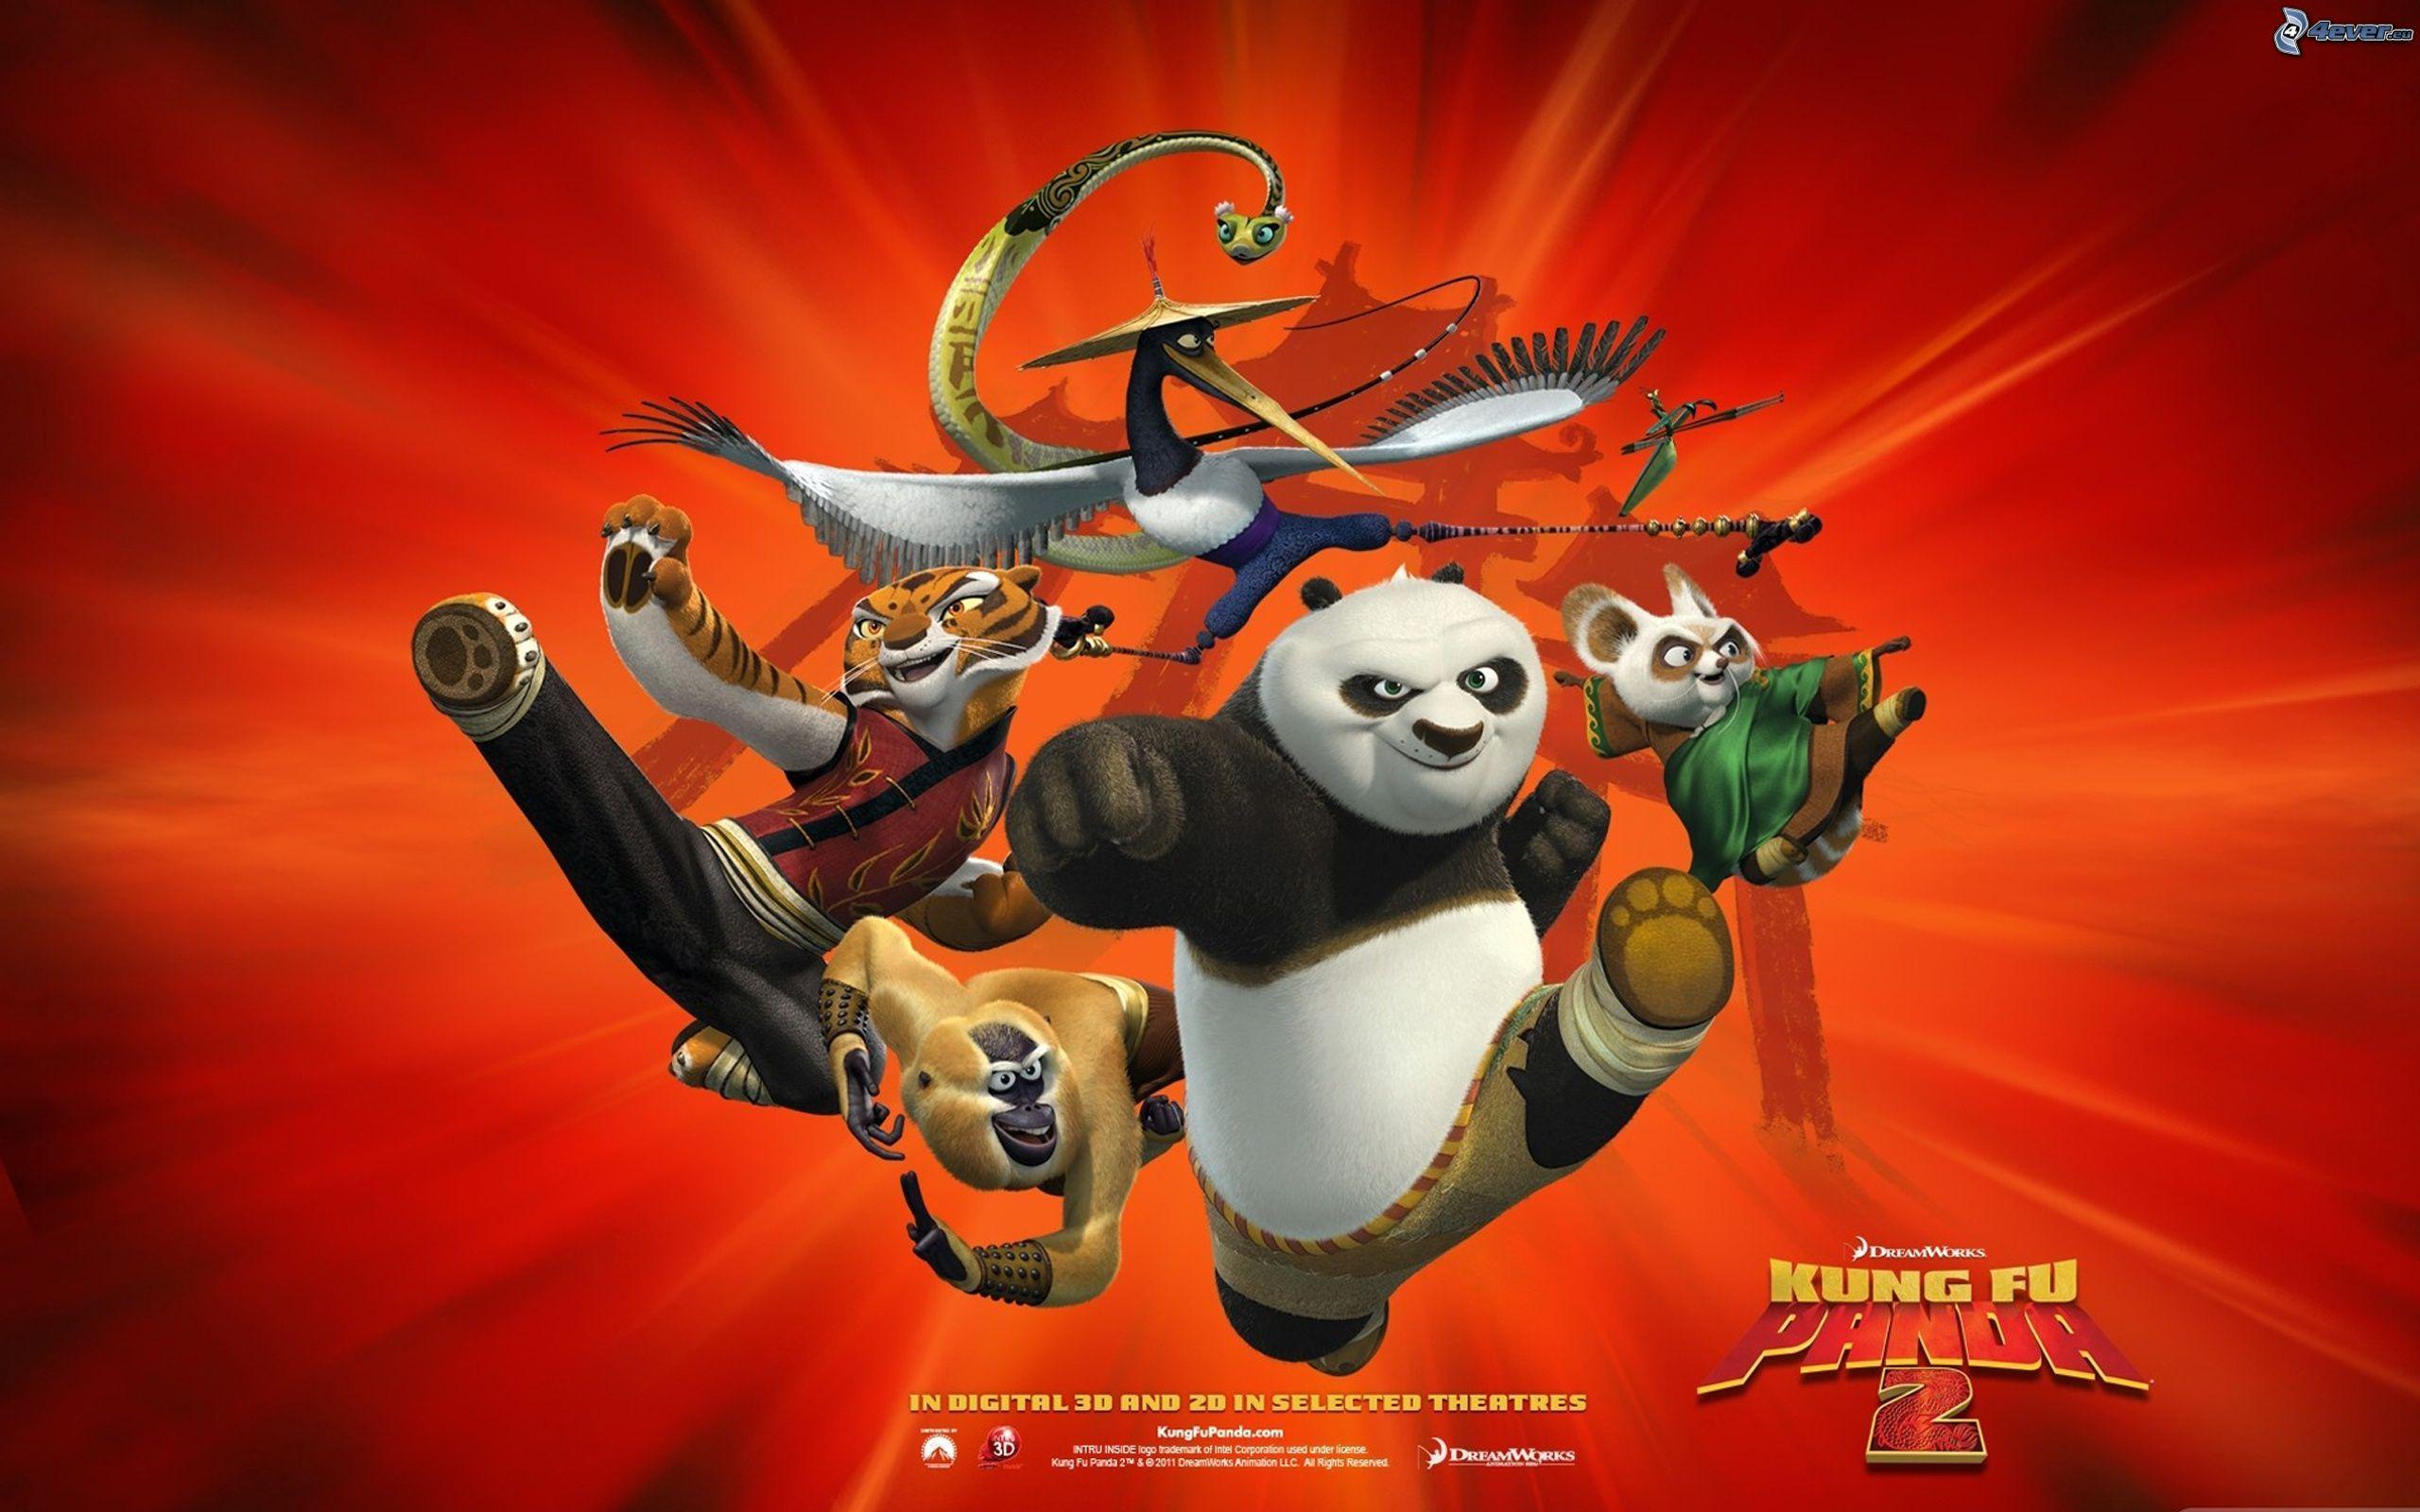 Kung fu panda 2 - Kung fu panda 3 telecharger ...